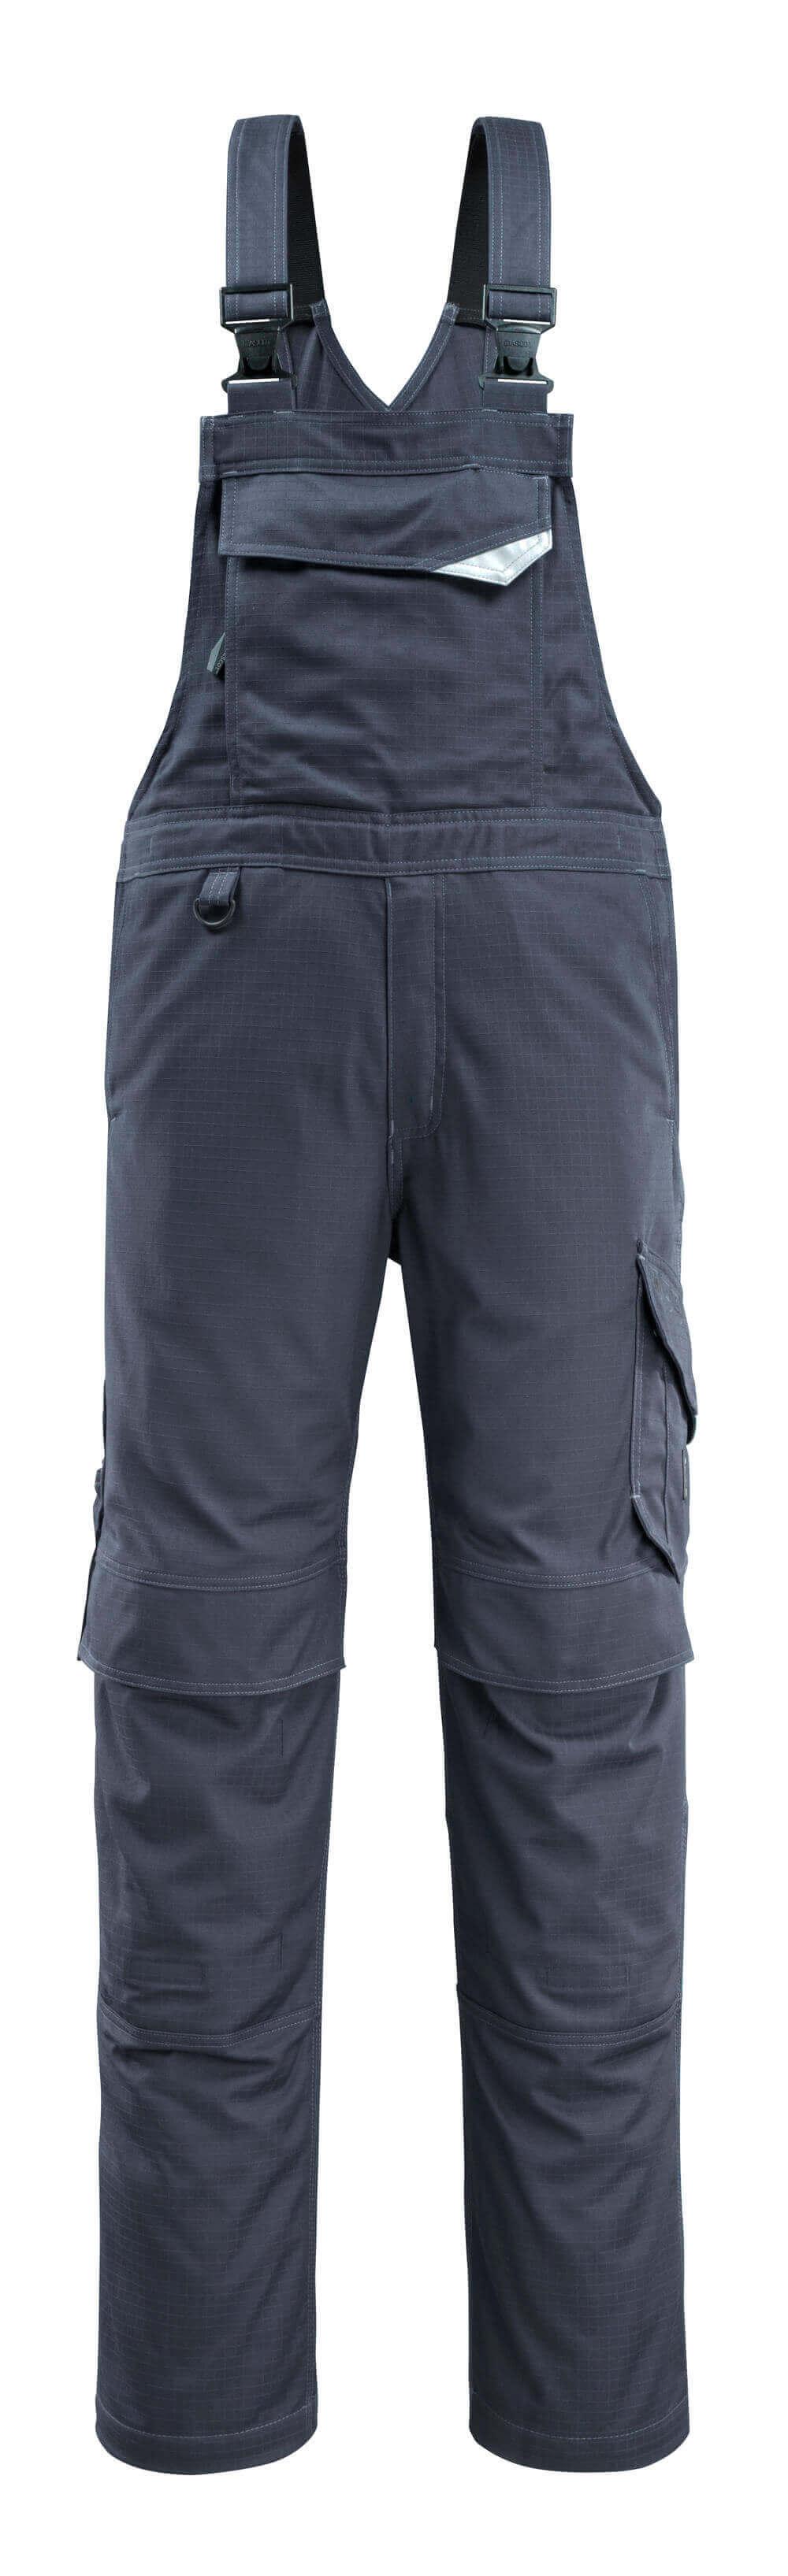 13669-216-010 Amerikaanse overall met kniezakken - donkermarine